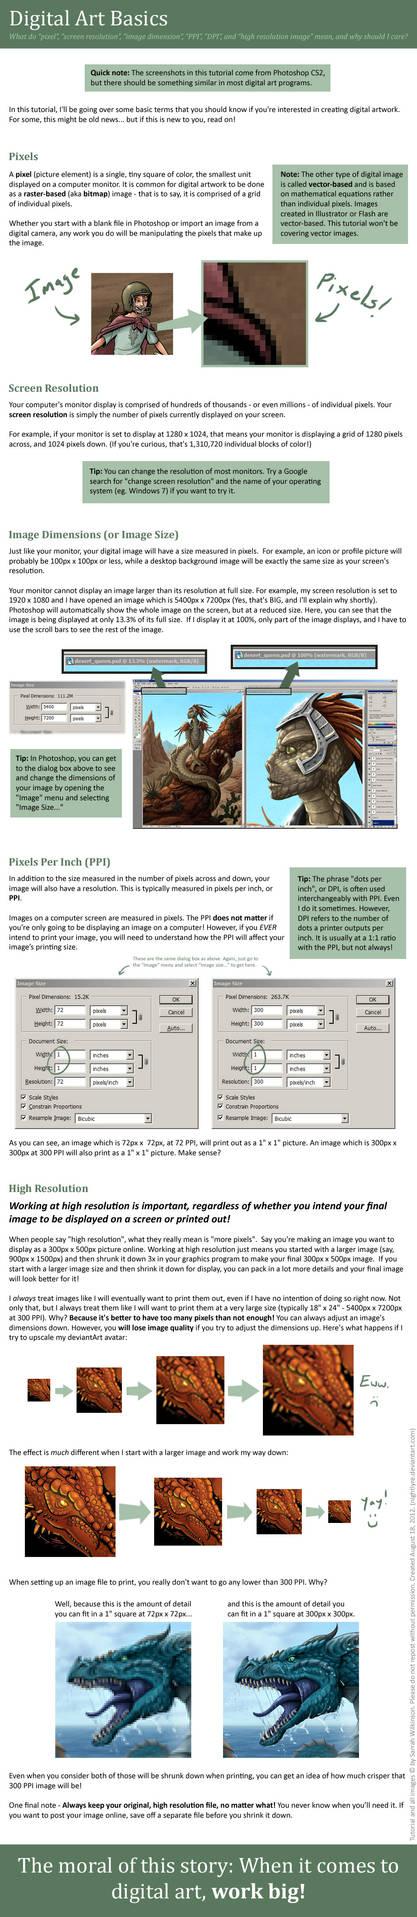 Tutorial: Digital Art Basics and Image Size Terms